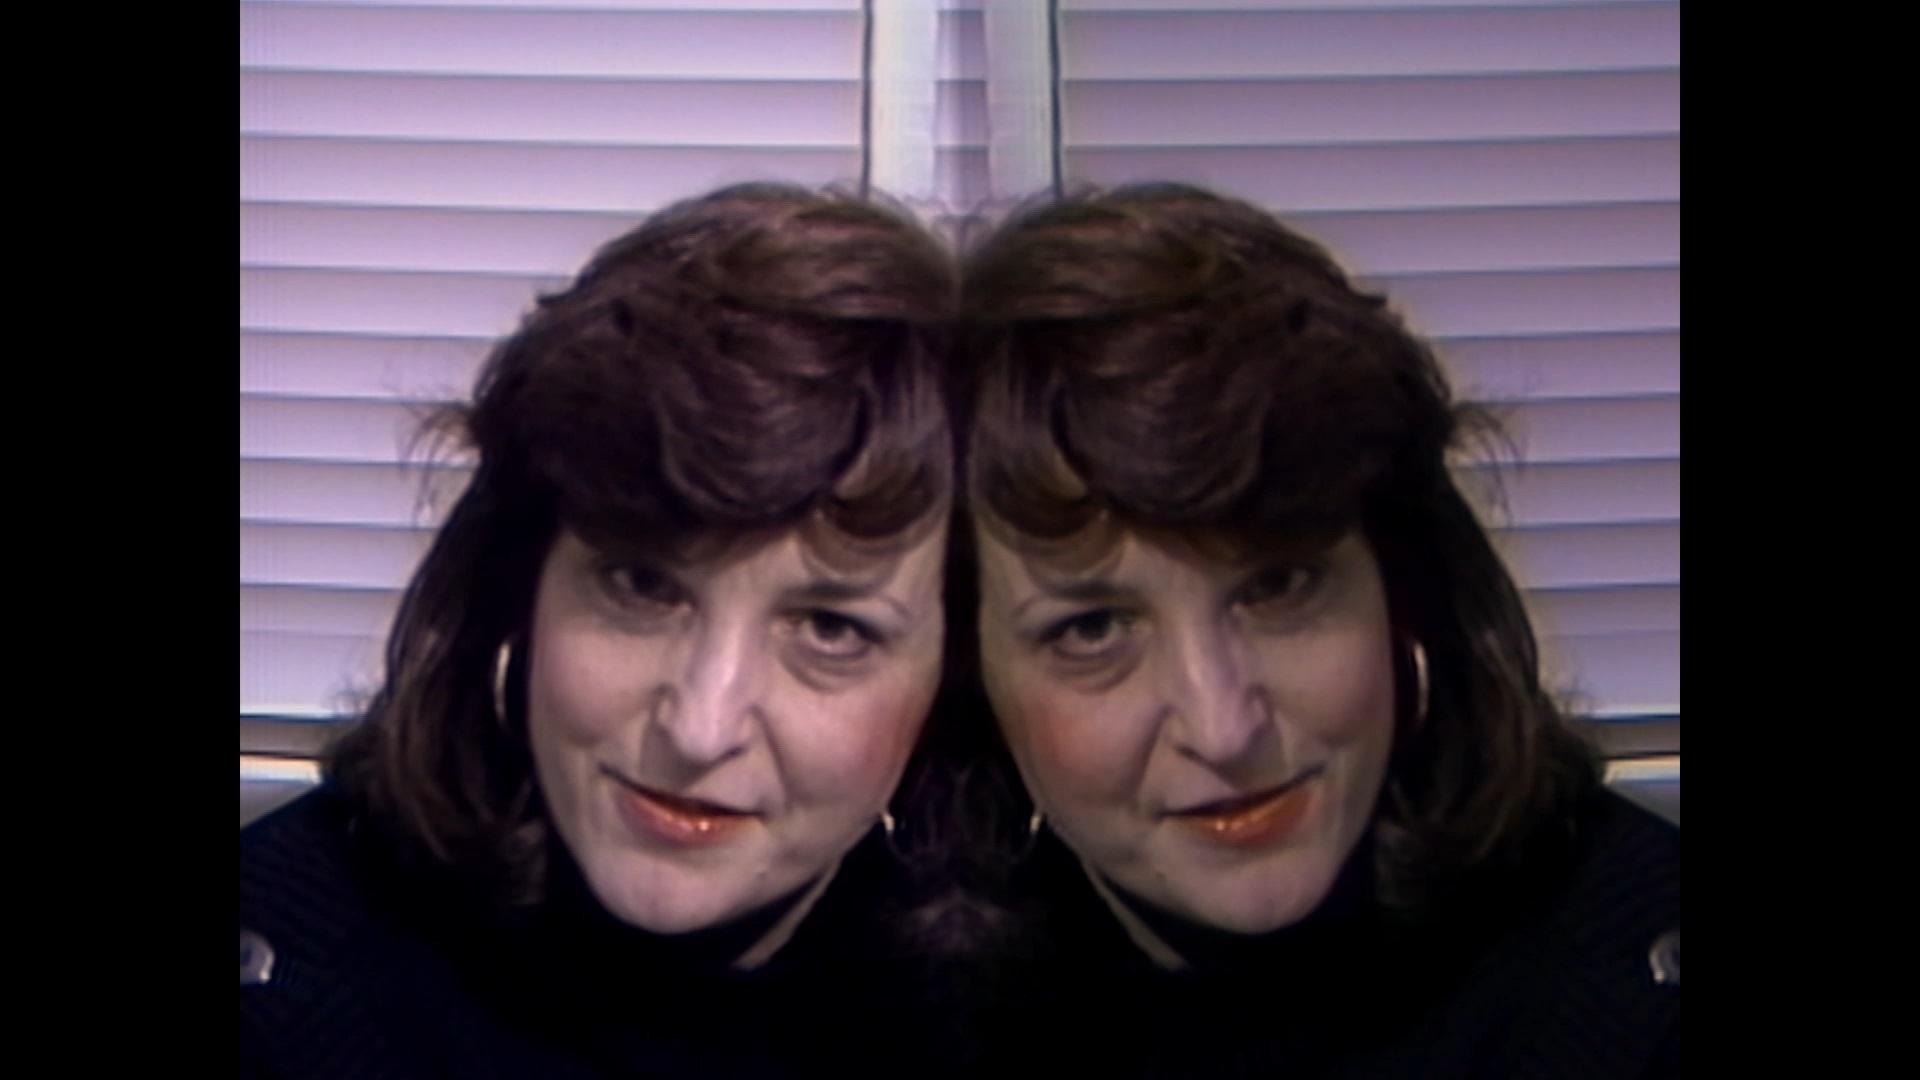 Lynn Hershman Leeson, <em>Binge</em> (1986-87) from <em>The Electronic Diaries</em>, 1984-2019 (still). Video, color, sound; 9:09 min. Courtesy the artist; Bridget Donahue, New York; and Altman Siegel, San Francisco